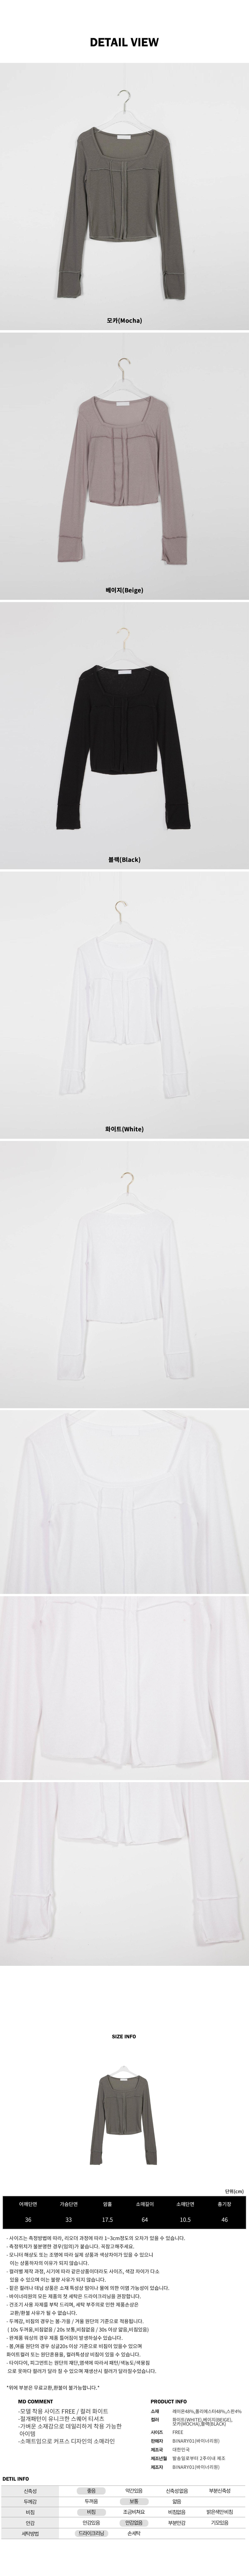 Split swell T-shirt